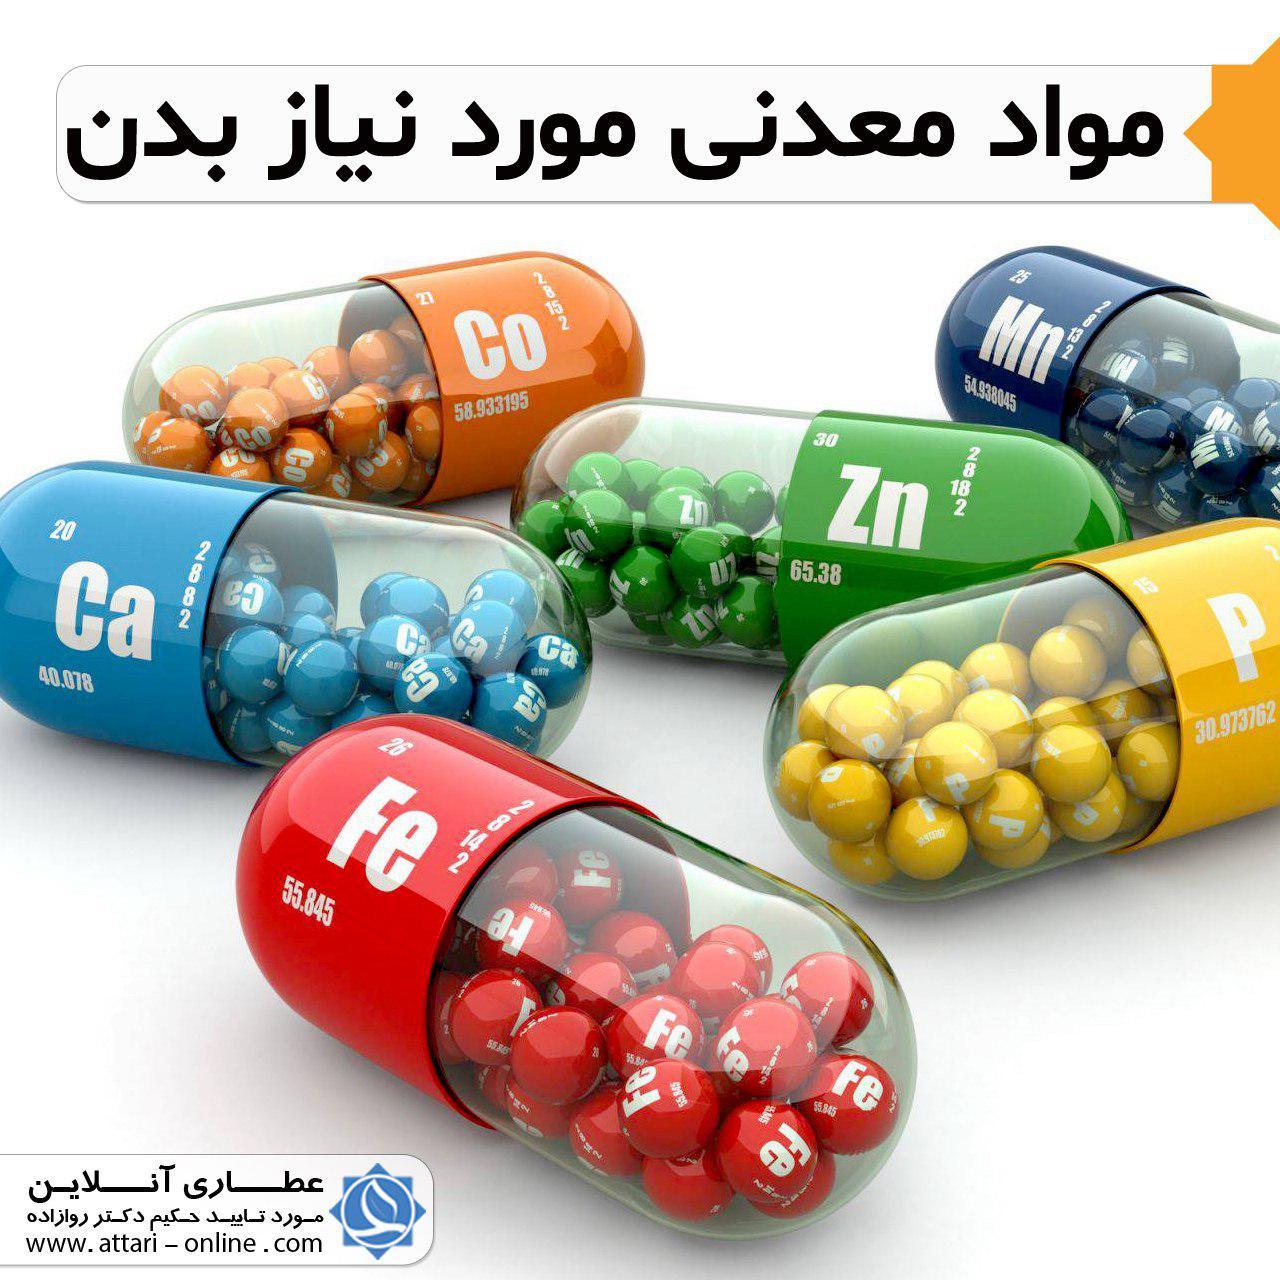 photo 2018 12 20 11 29 32 مواد معدنی مورد نیاز بدن